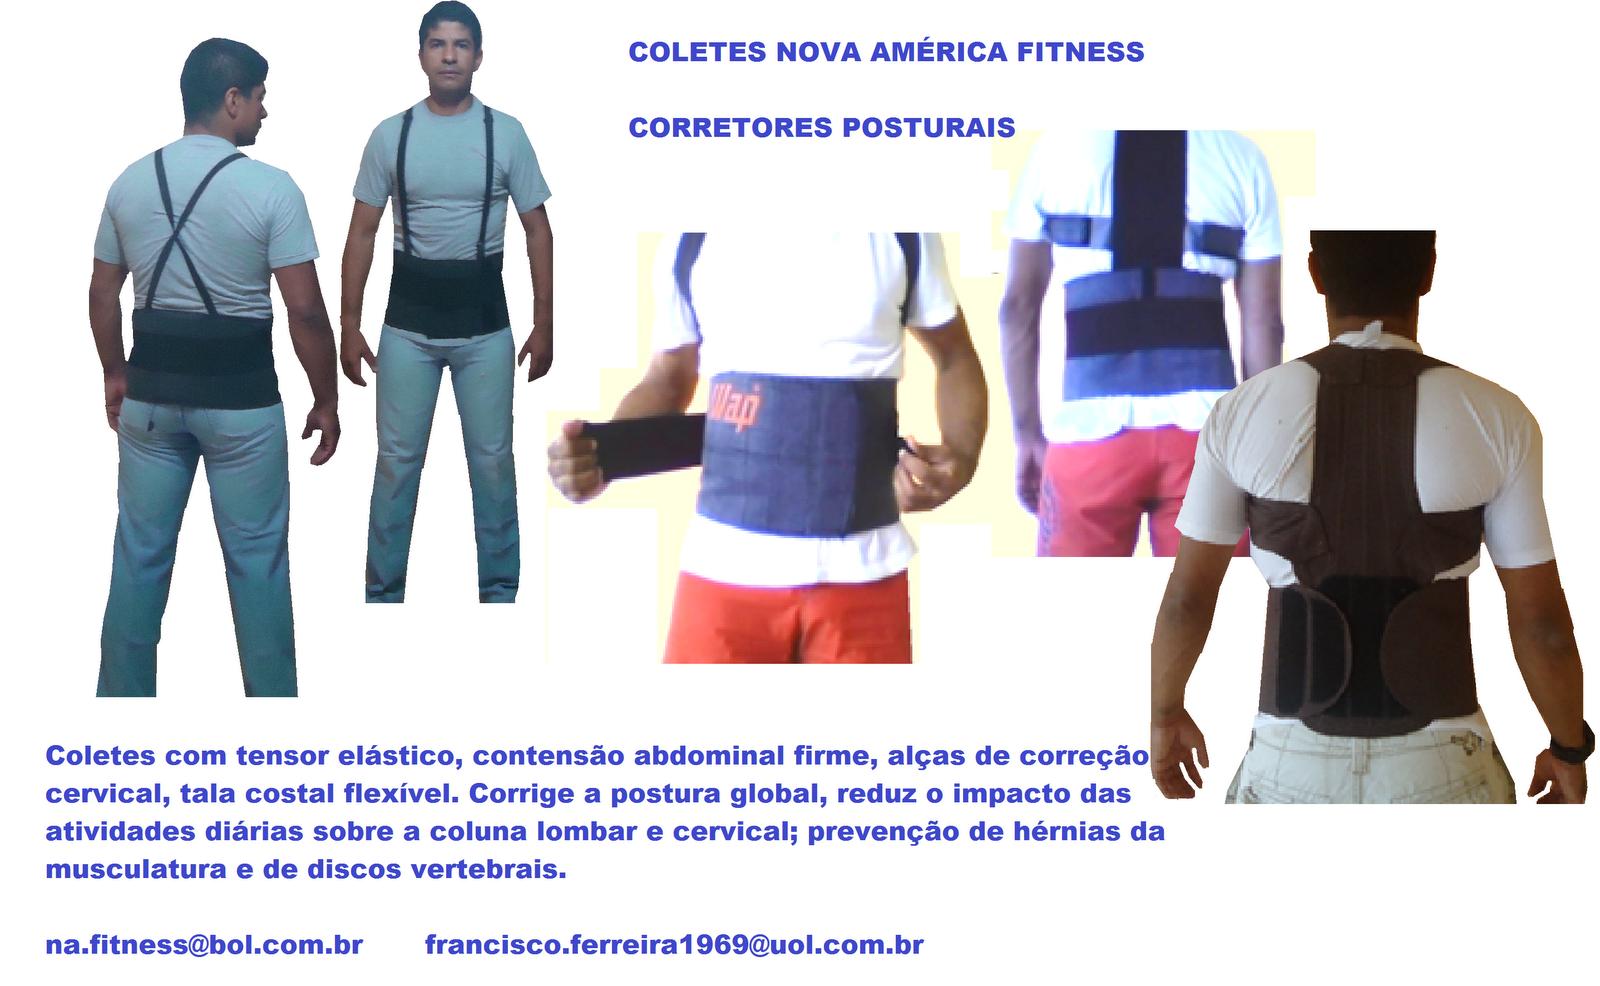 NA. FITNESS COLETES POSTURAIS